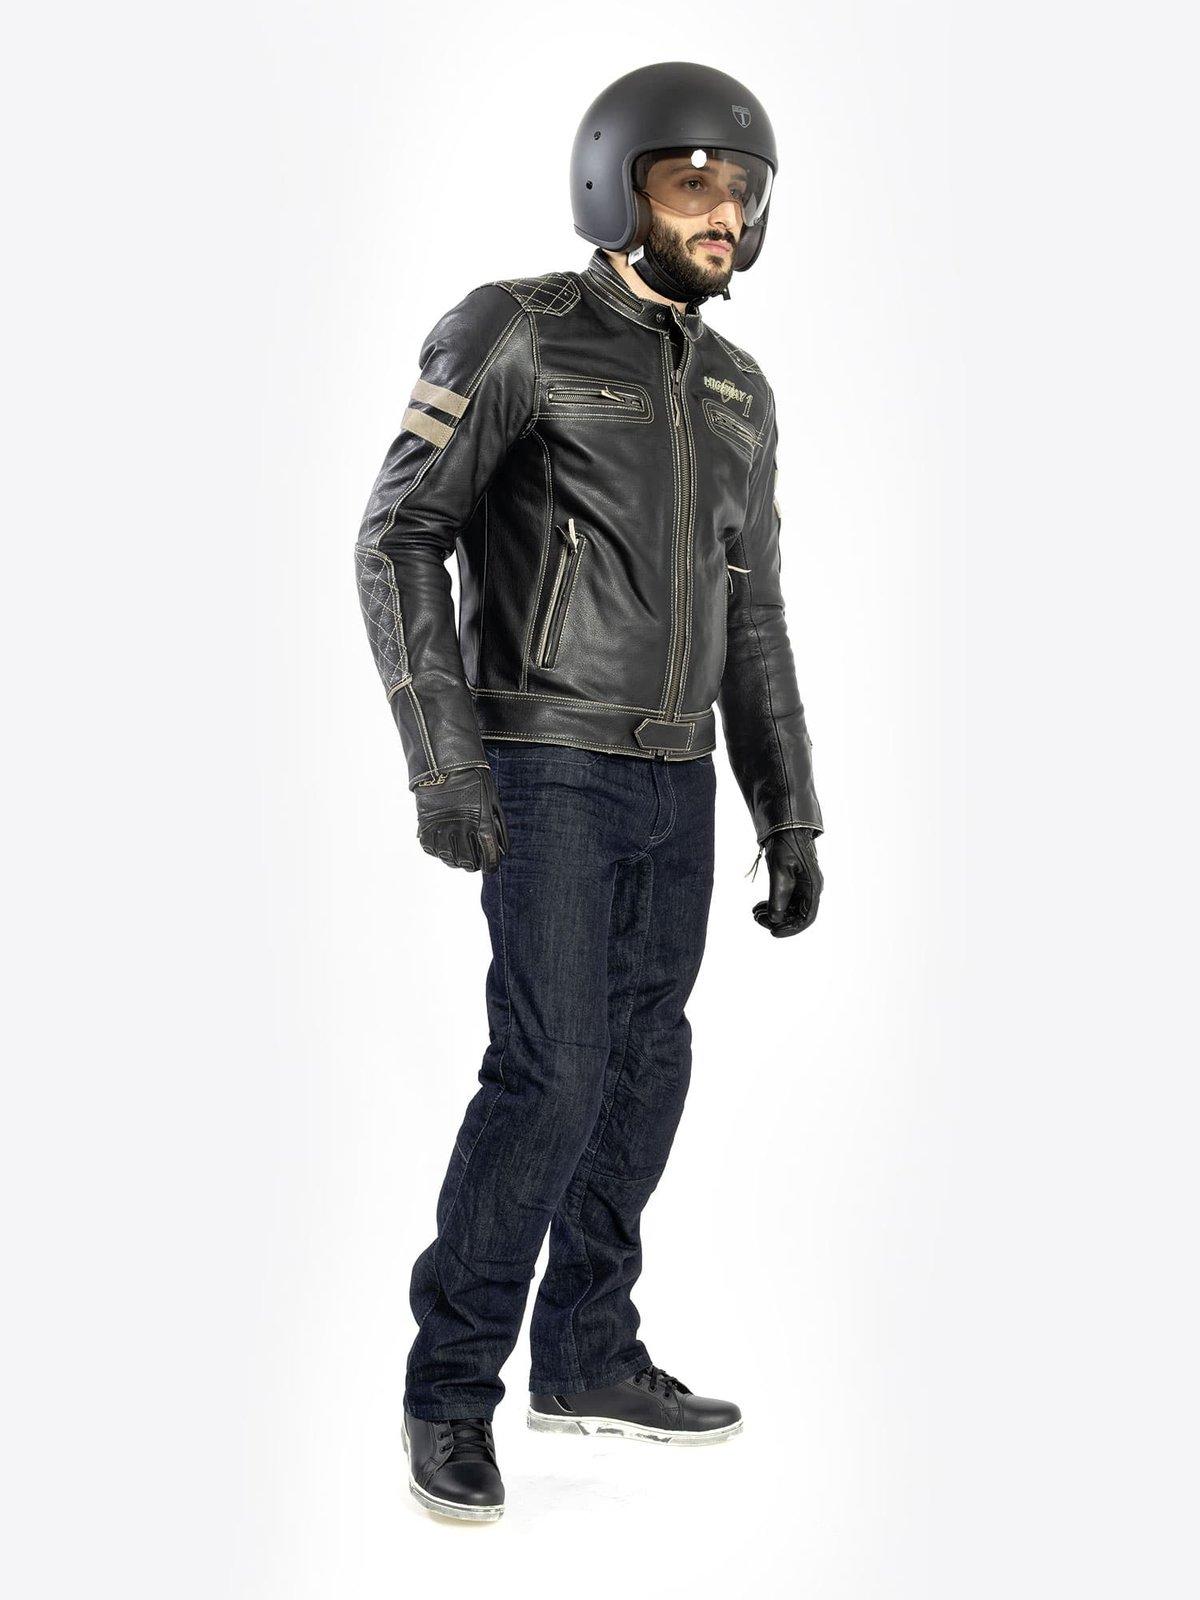 Typberatung - Chopper/Cruiser Motorradfahrer